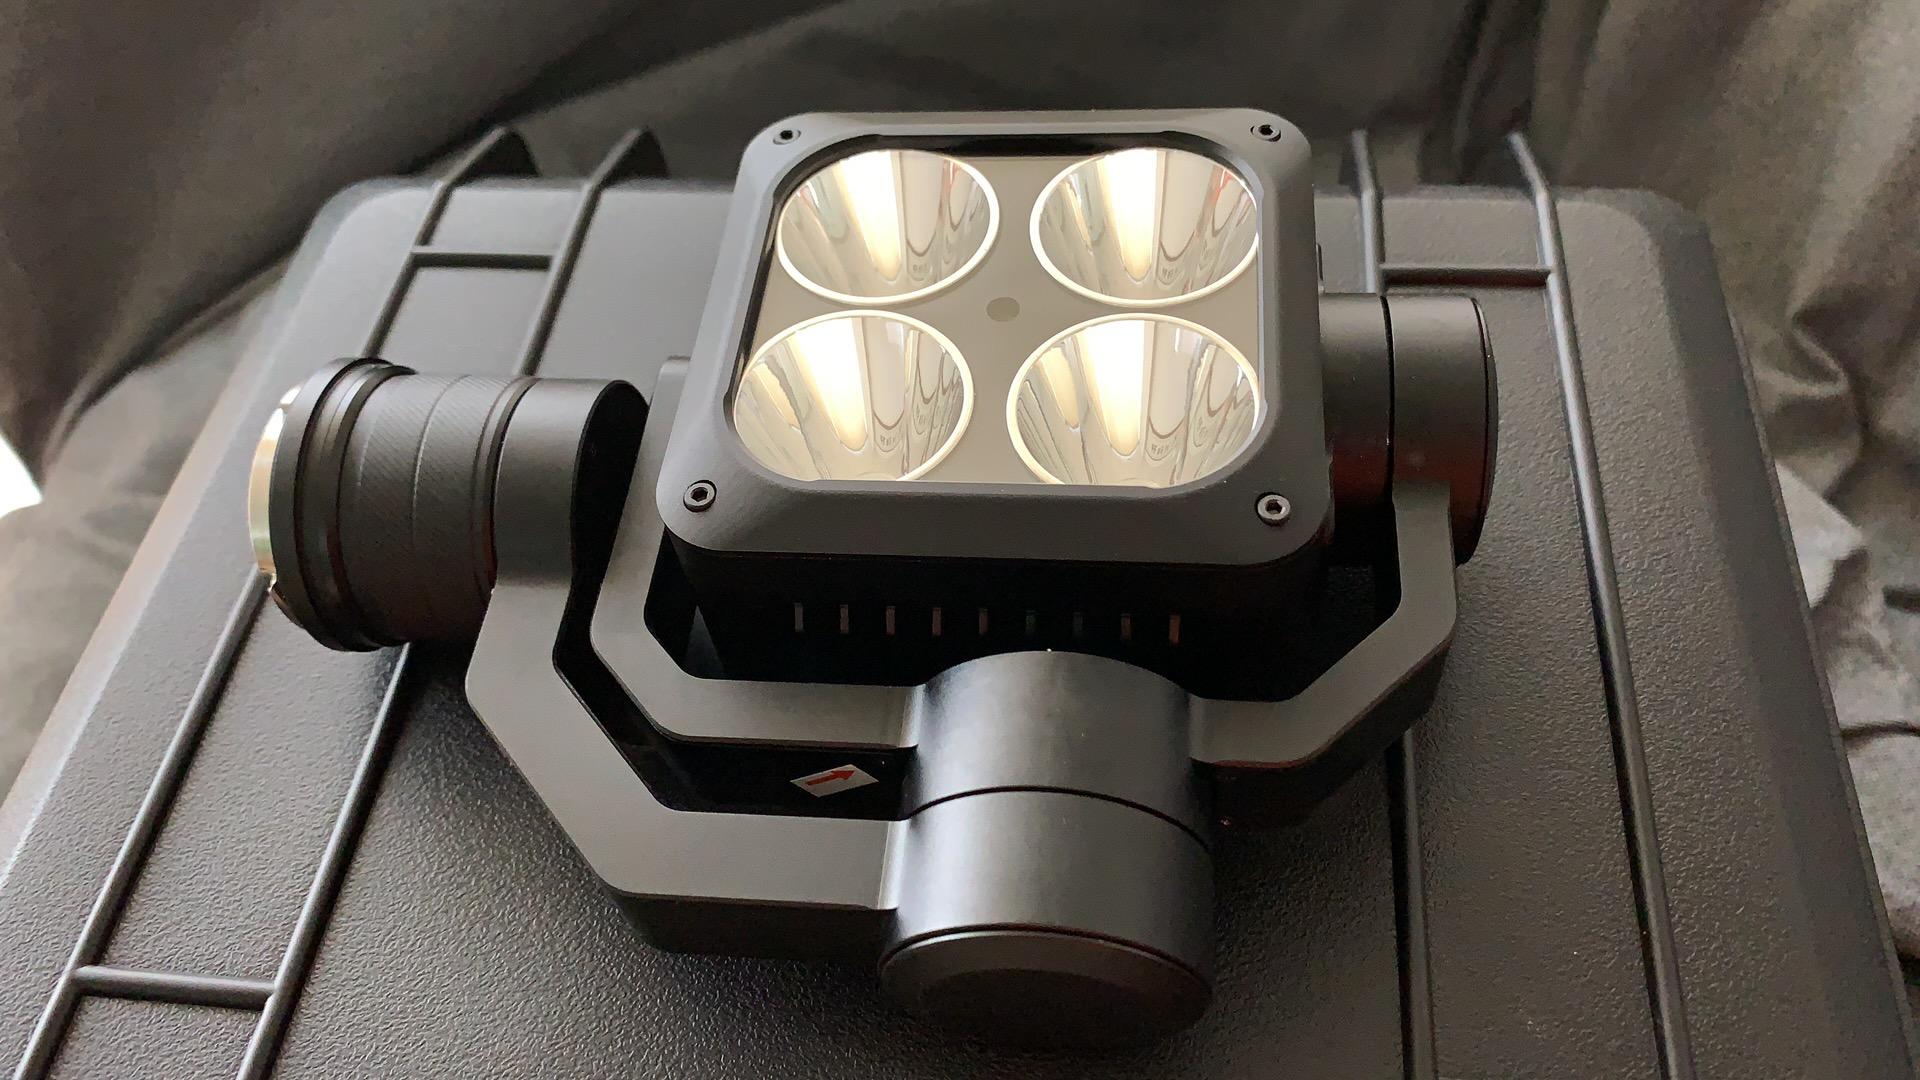 DJI Matrice 200 210 spotlights DJI SDK Payload